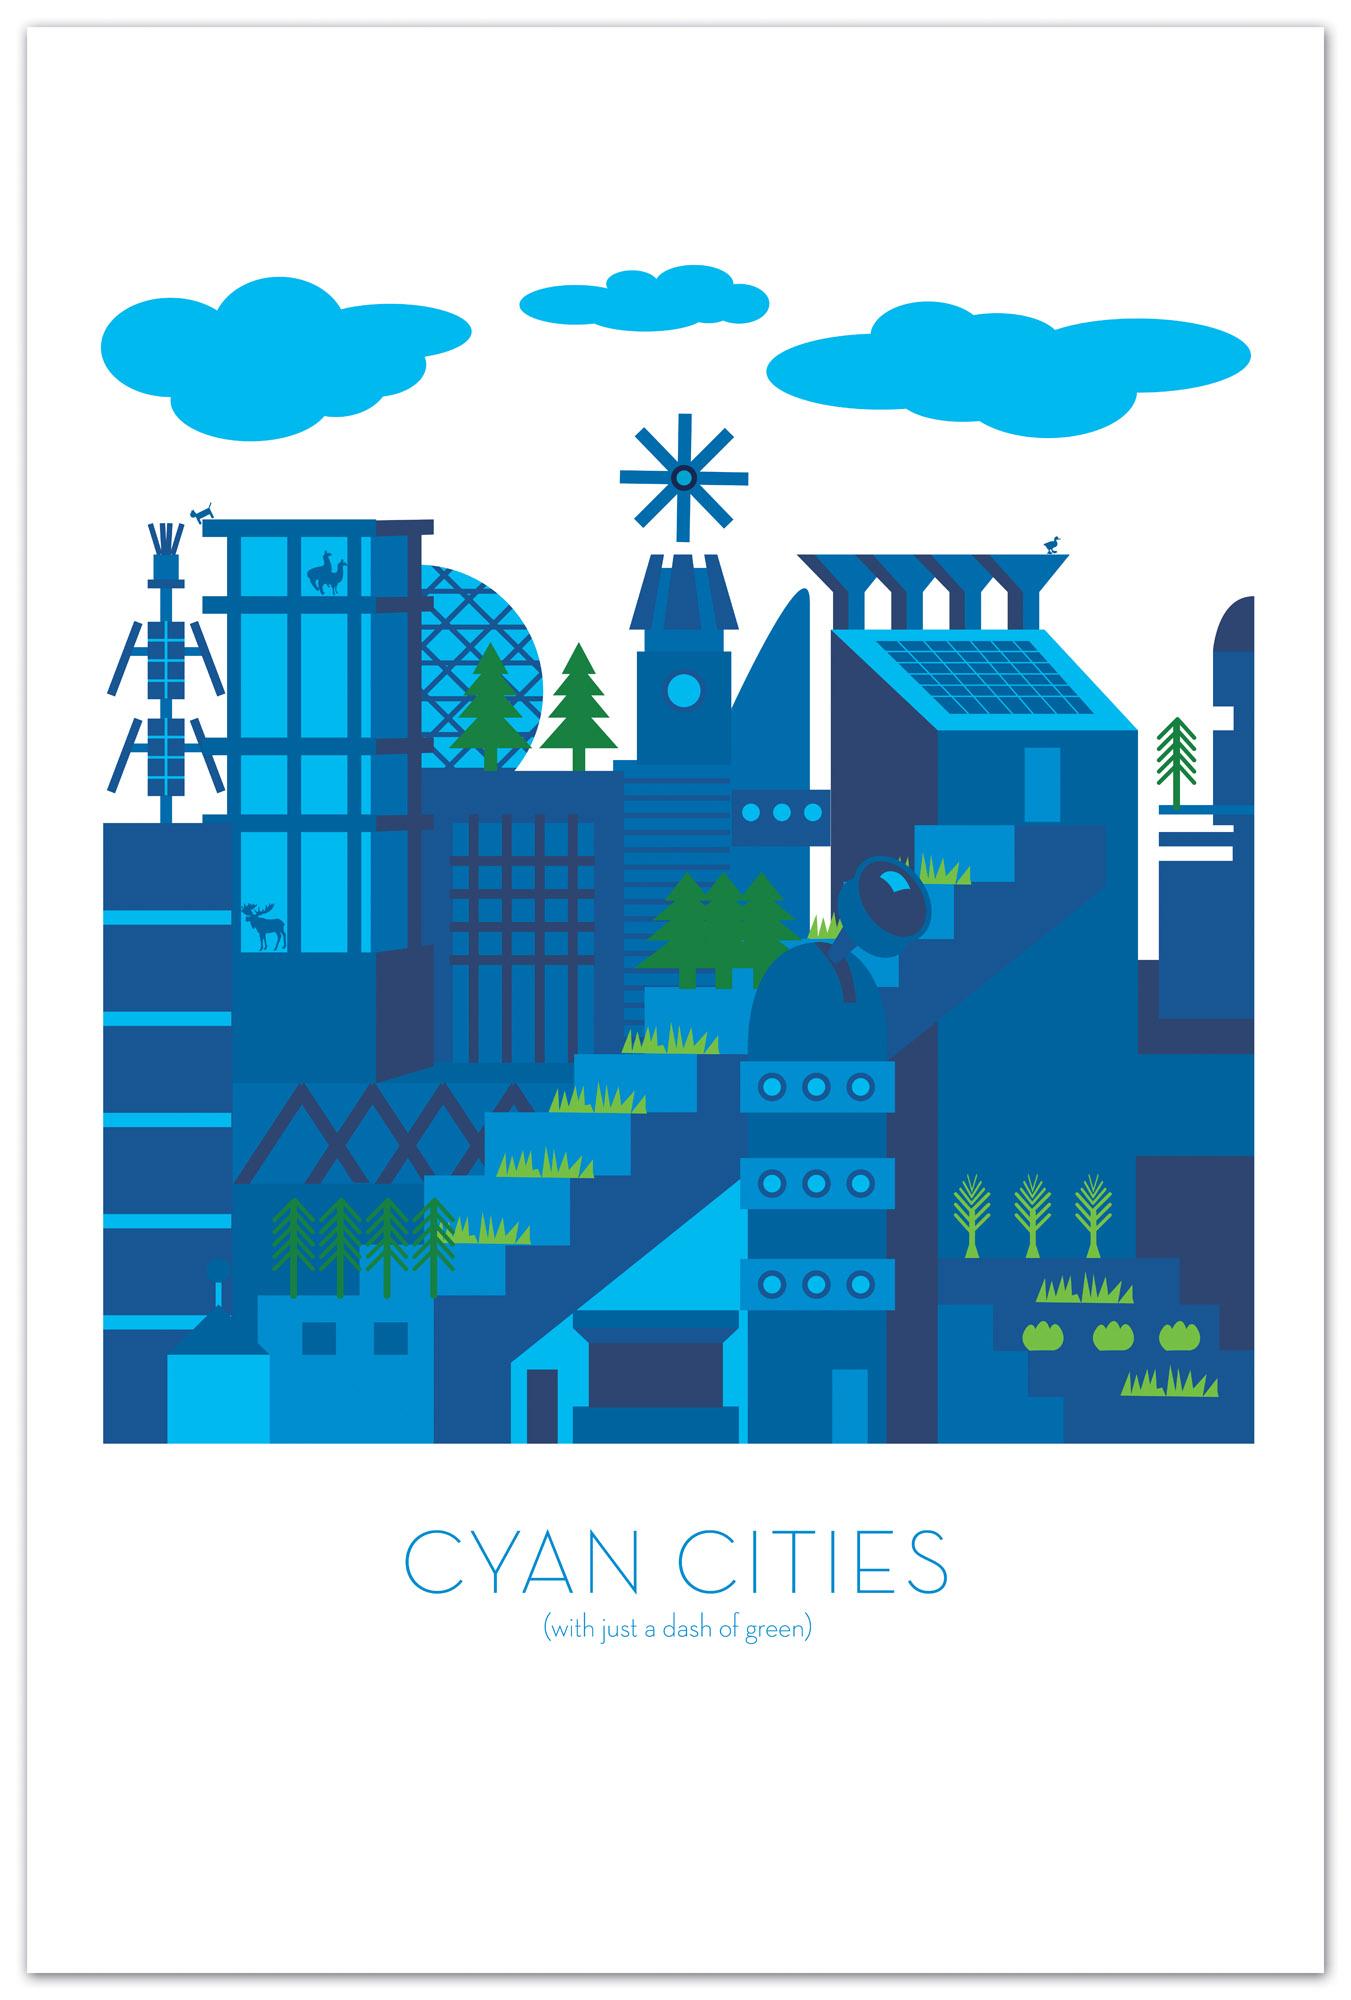 Cyan Cities